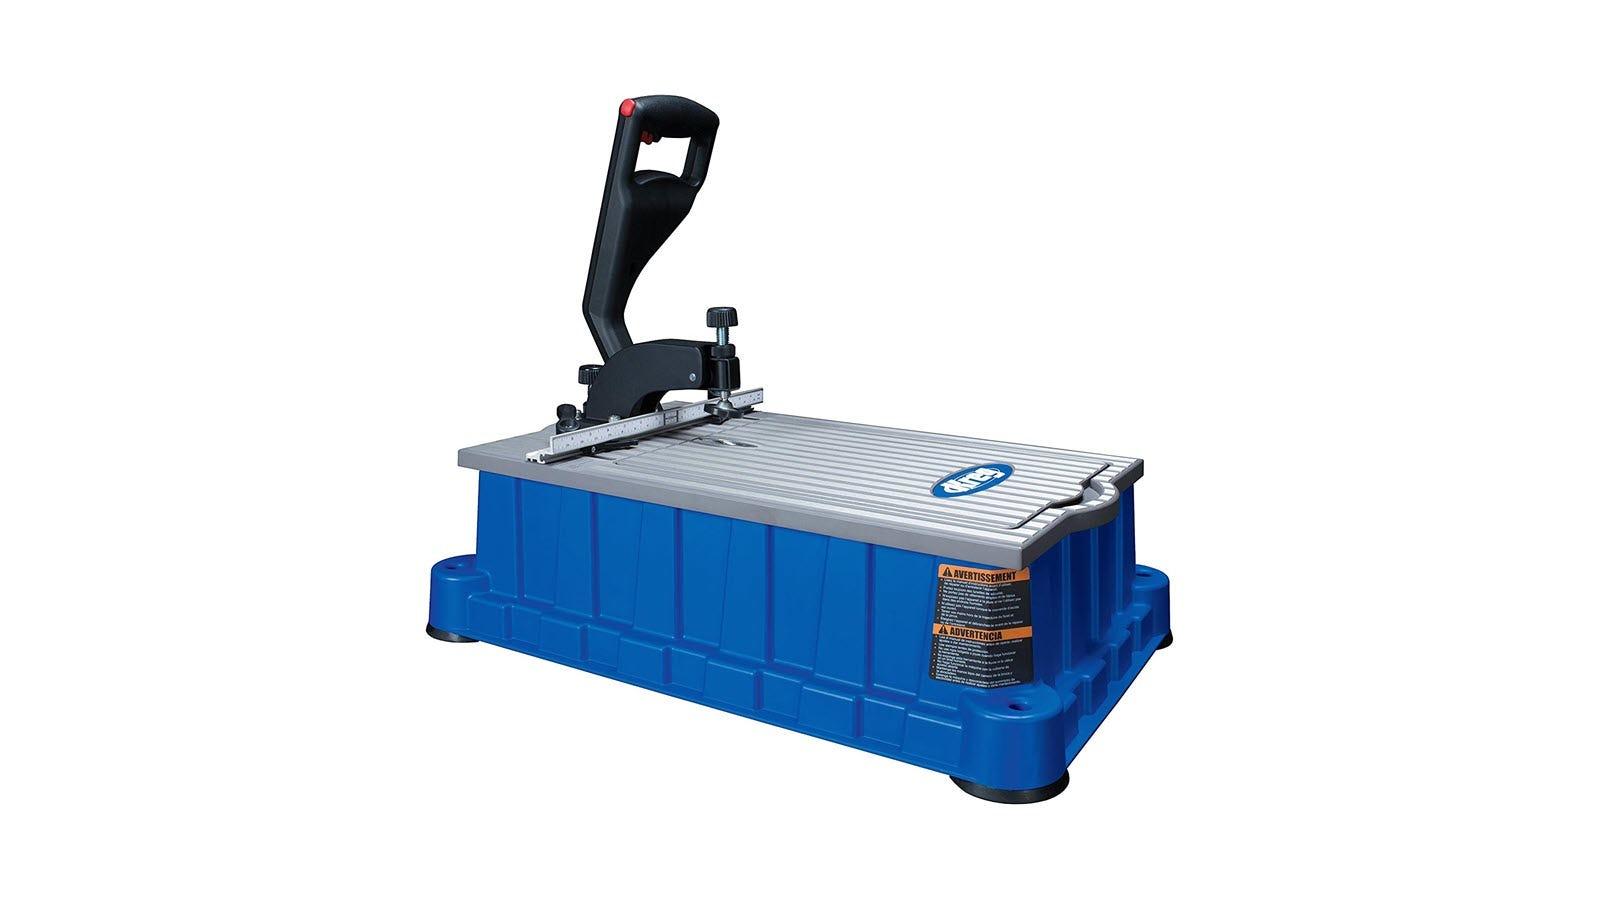 A blue Kreg pocket hole machine with large black handle.